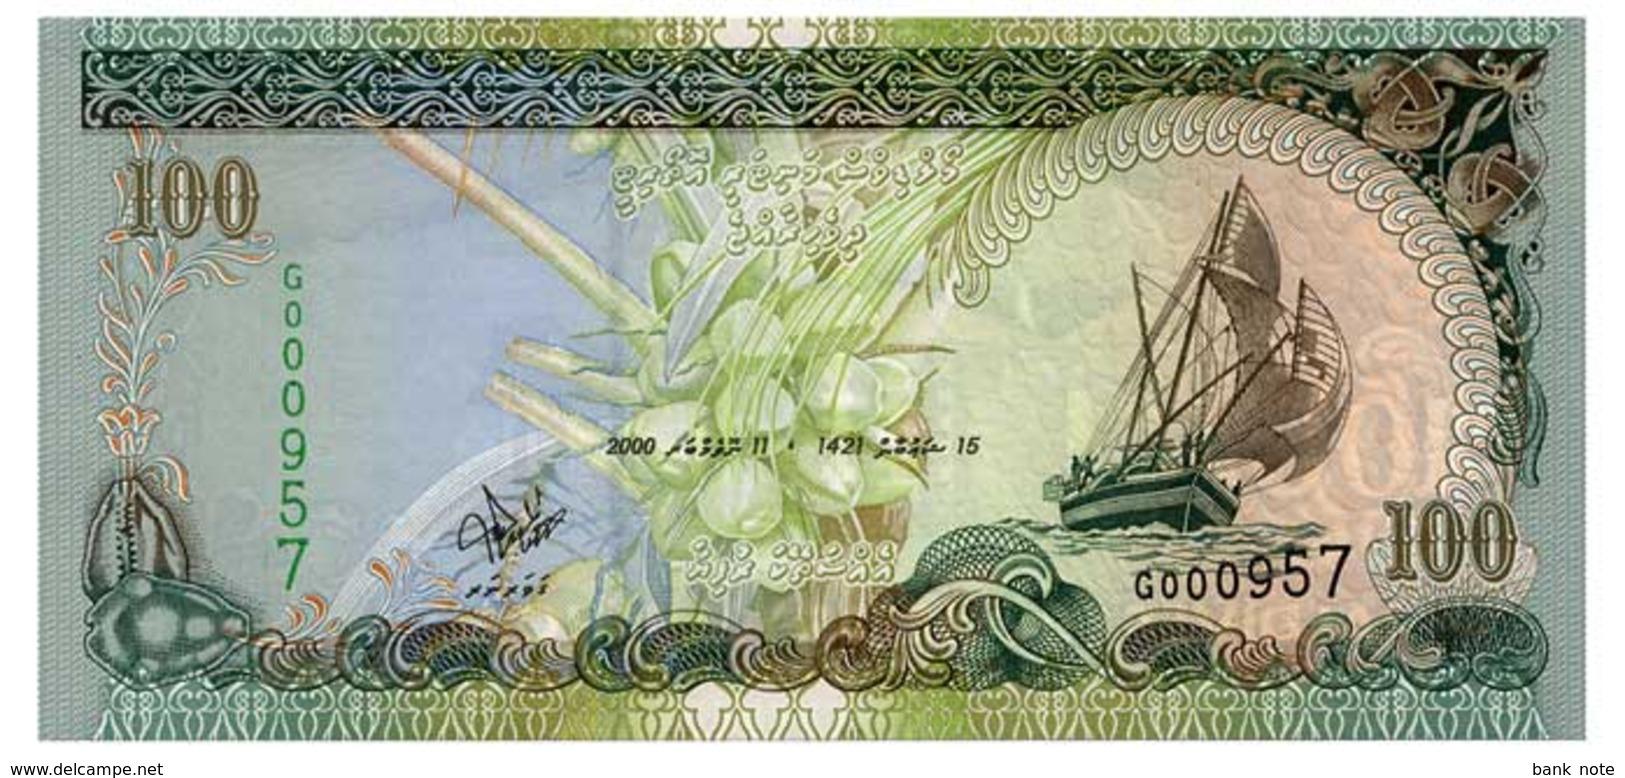 MALDIVES 100 RUFIYAA 2000 Pick 22 Unc - Maldives